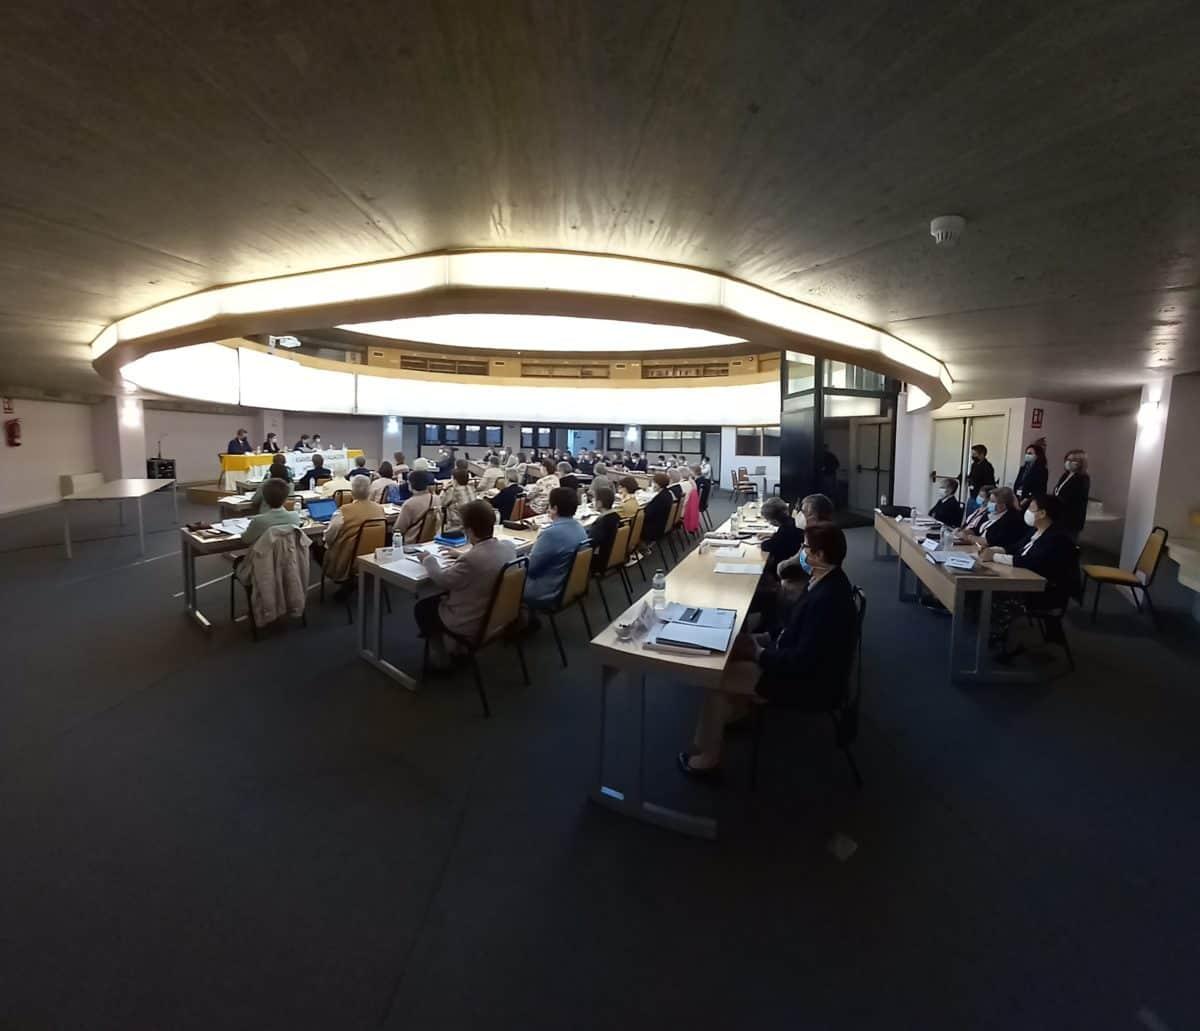 Tercera Jornada de la I Asamblea de Evaluación